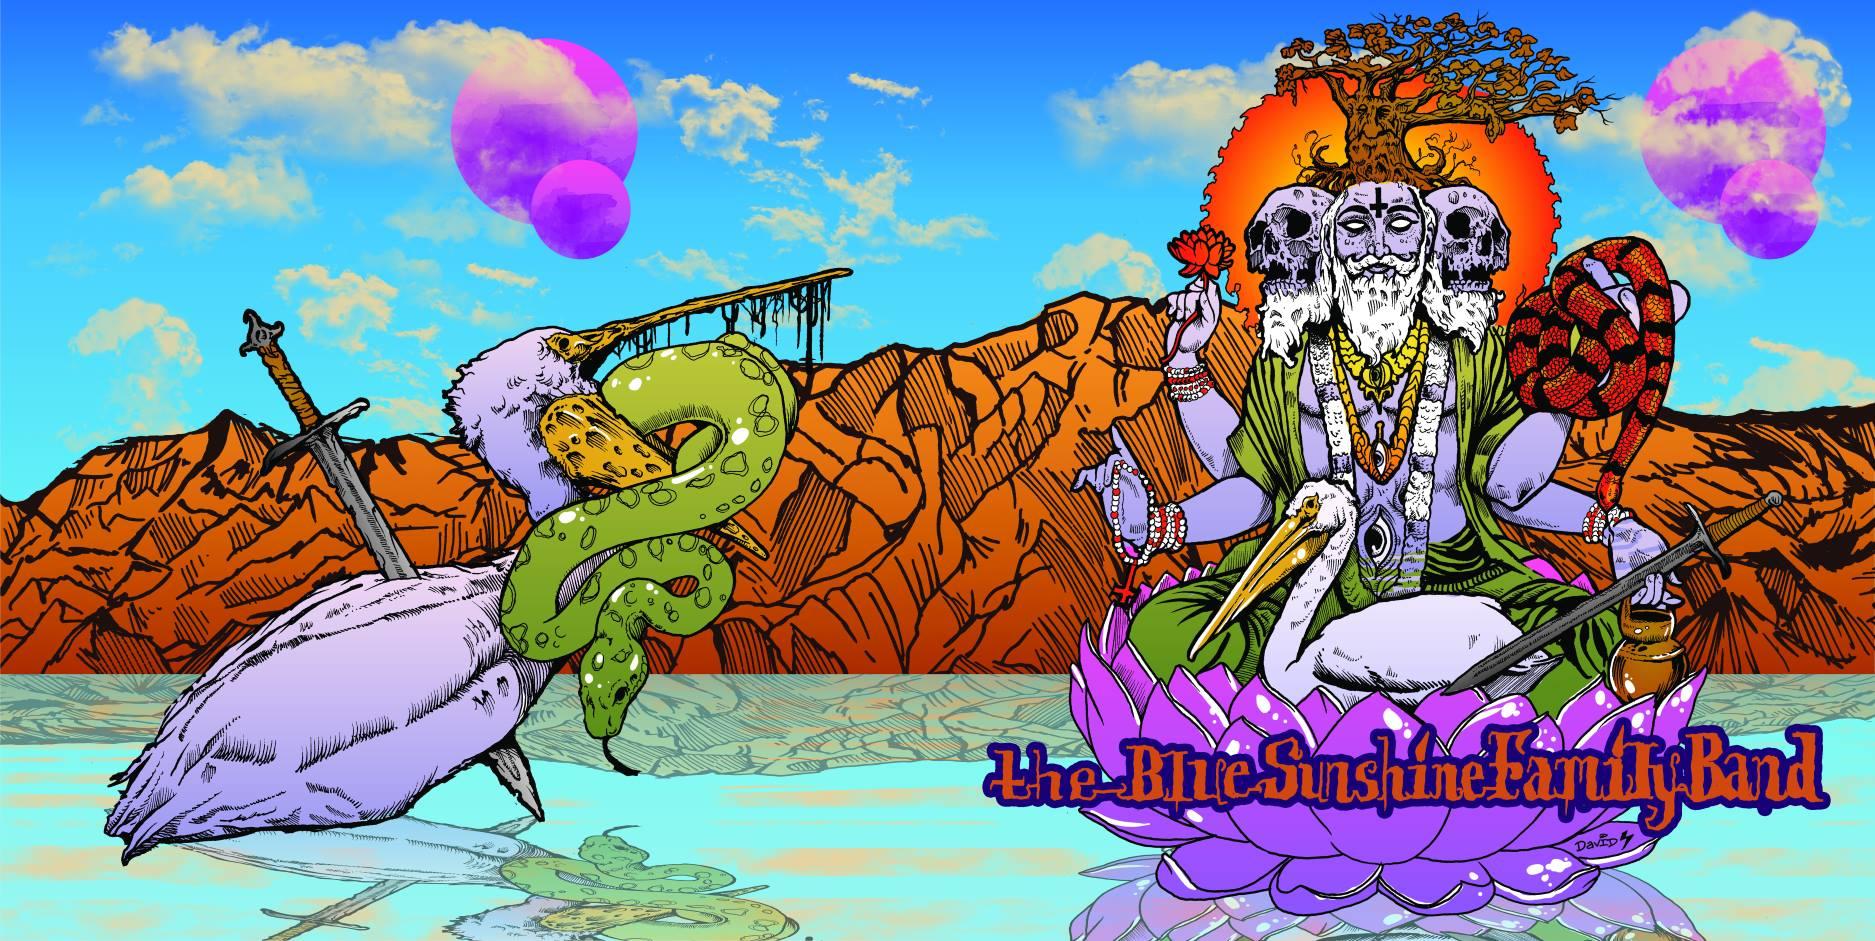 Album Cover Deluxe